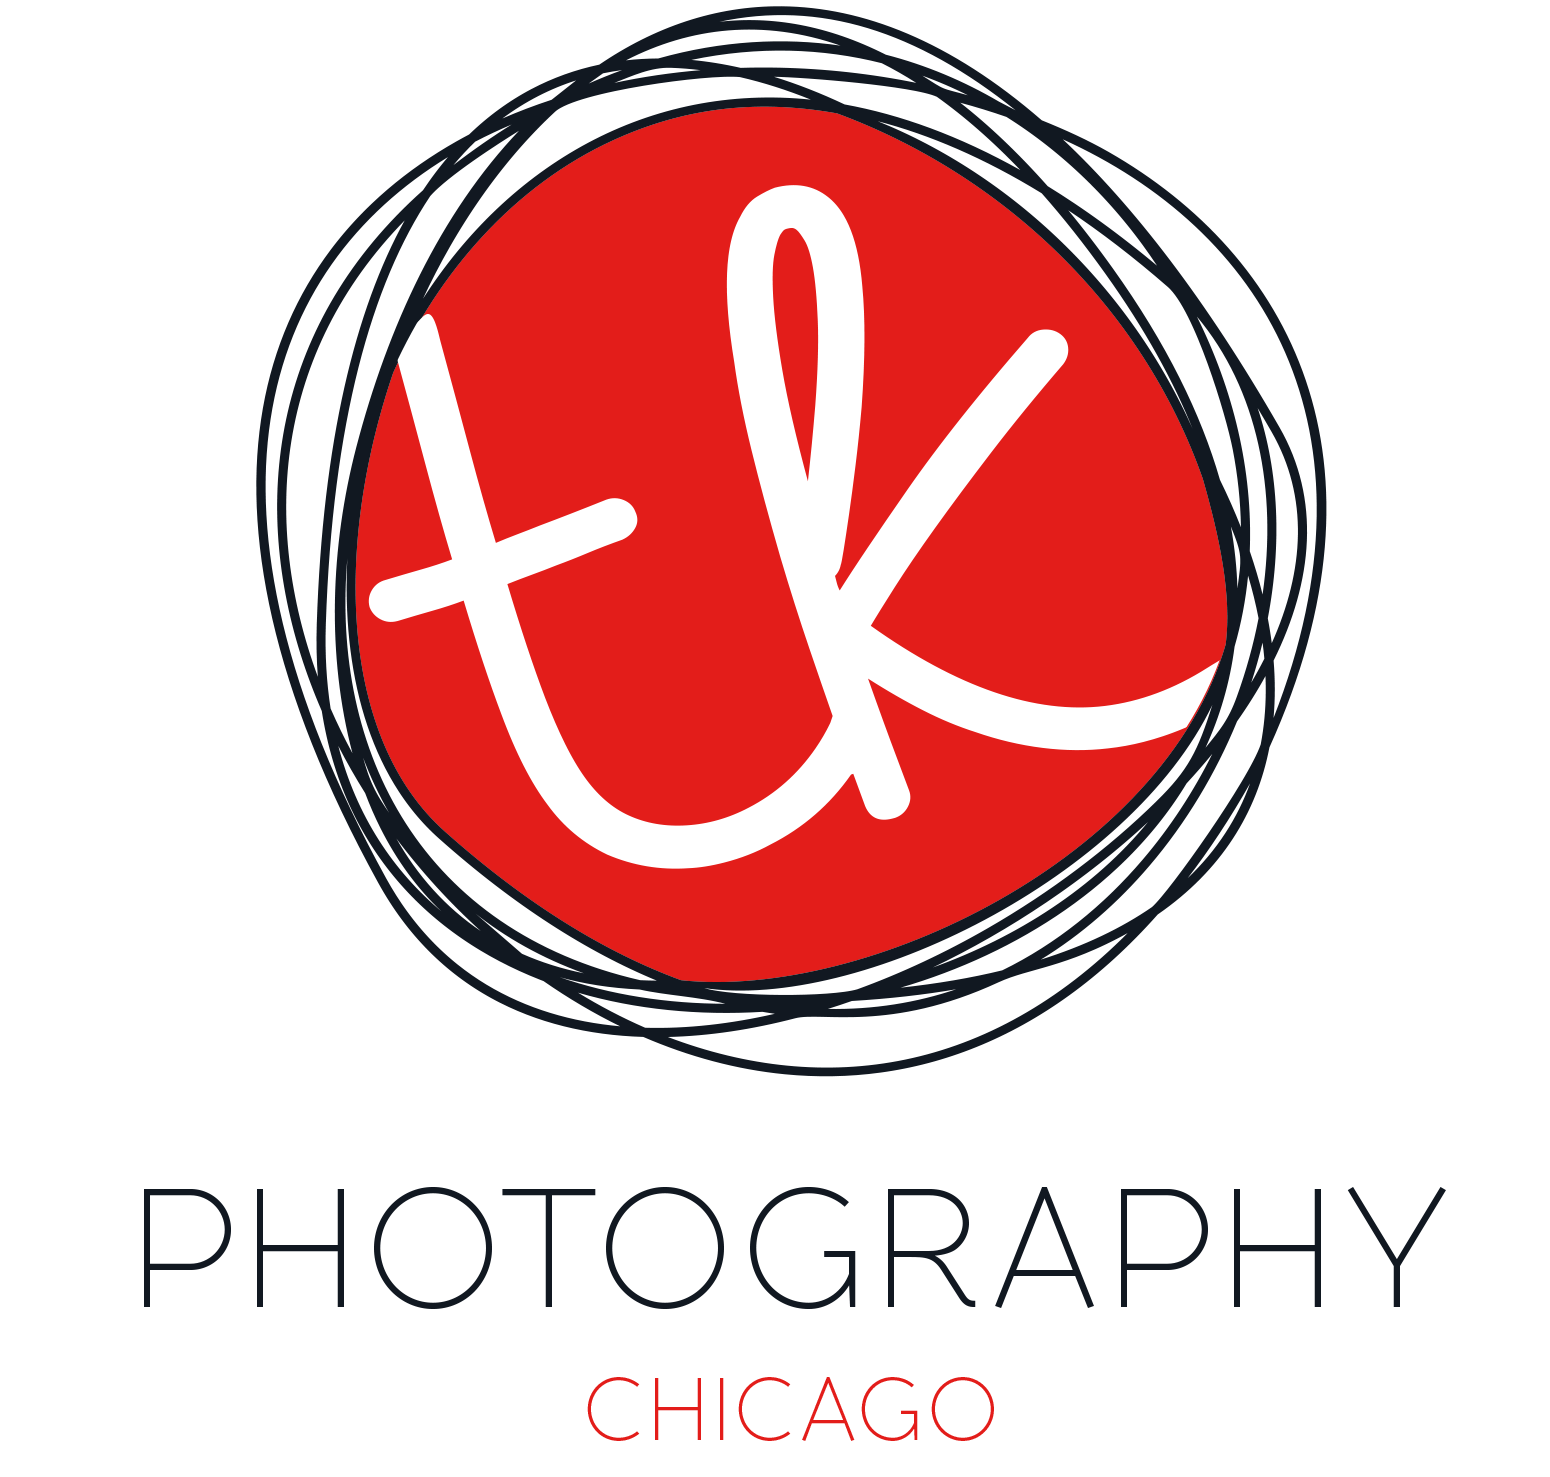 TK Photography